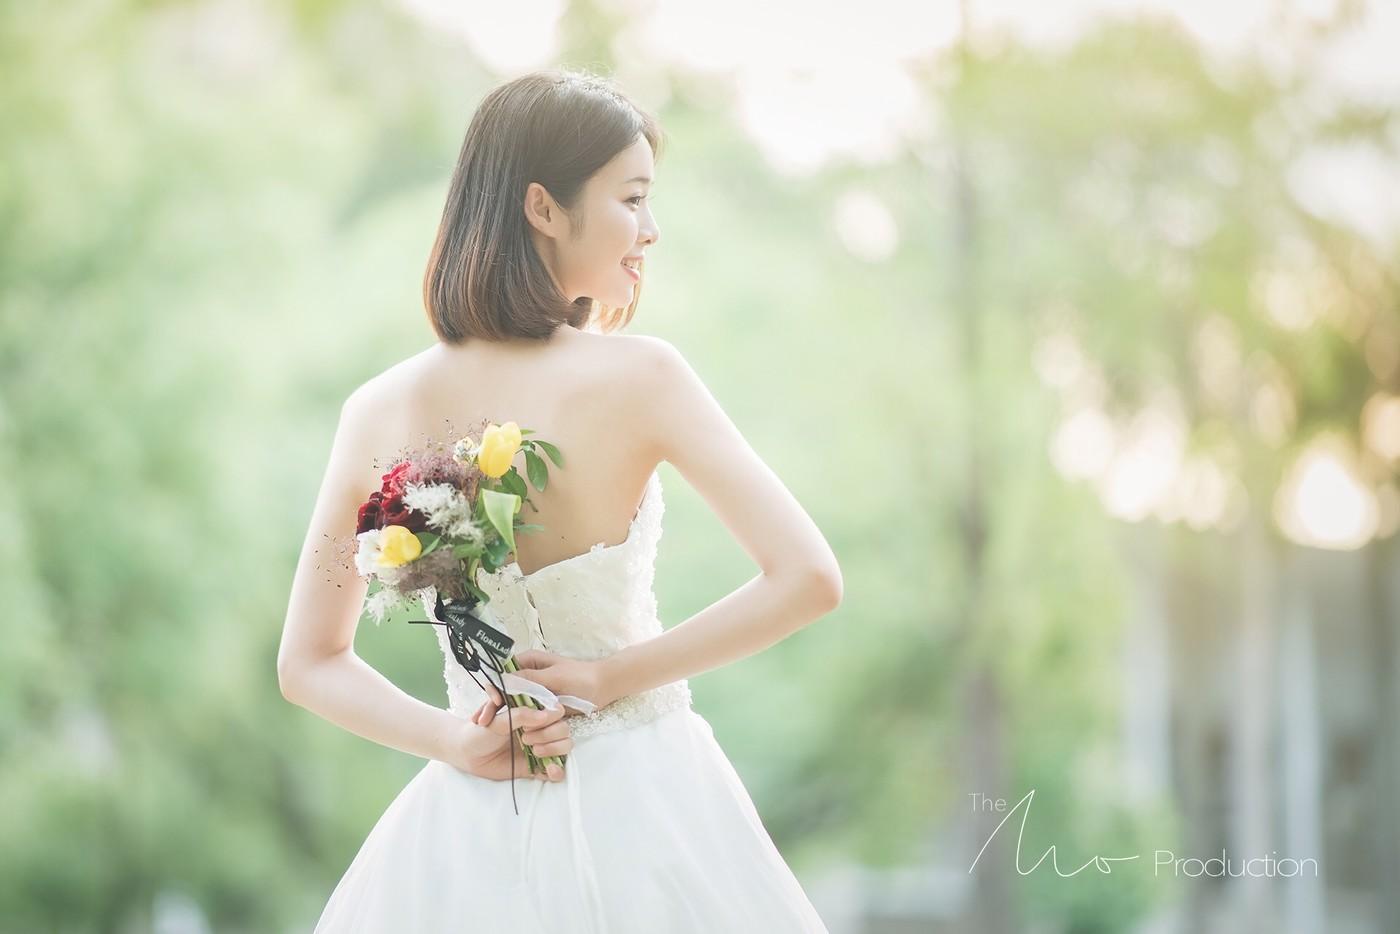 MoFoTo 深圳婚纱个人13